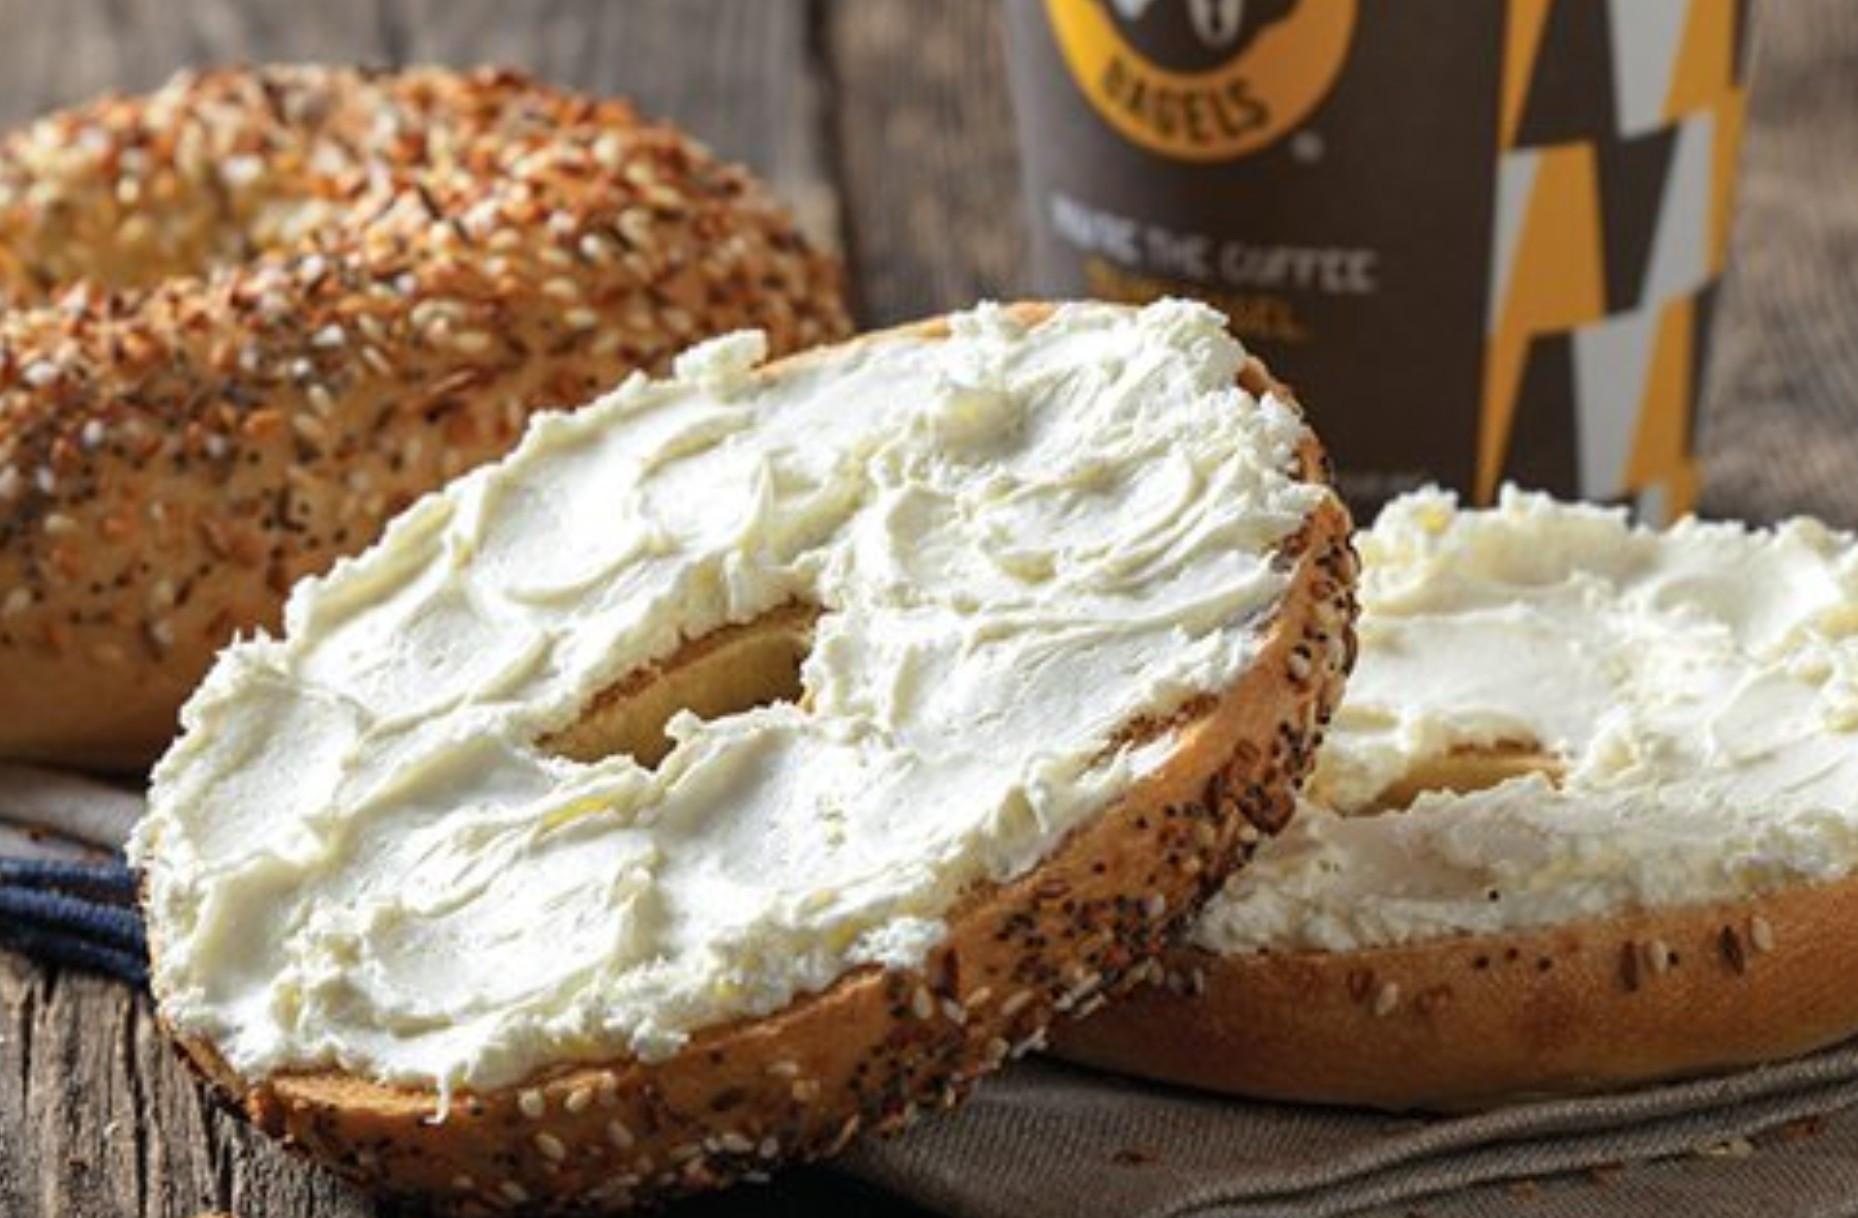 Einstein Bros Bagels Vegan  Biggest Bagel Chain In US Adds Vegan Cream Cheese In